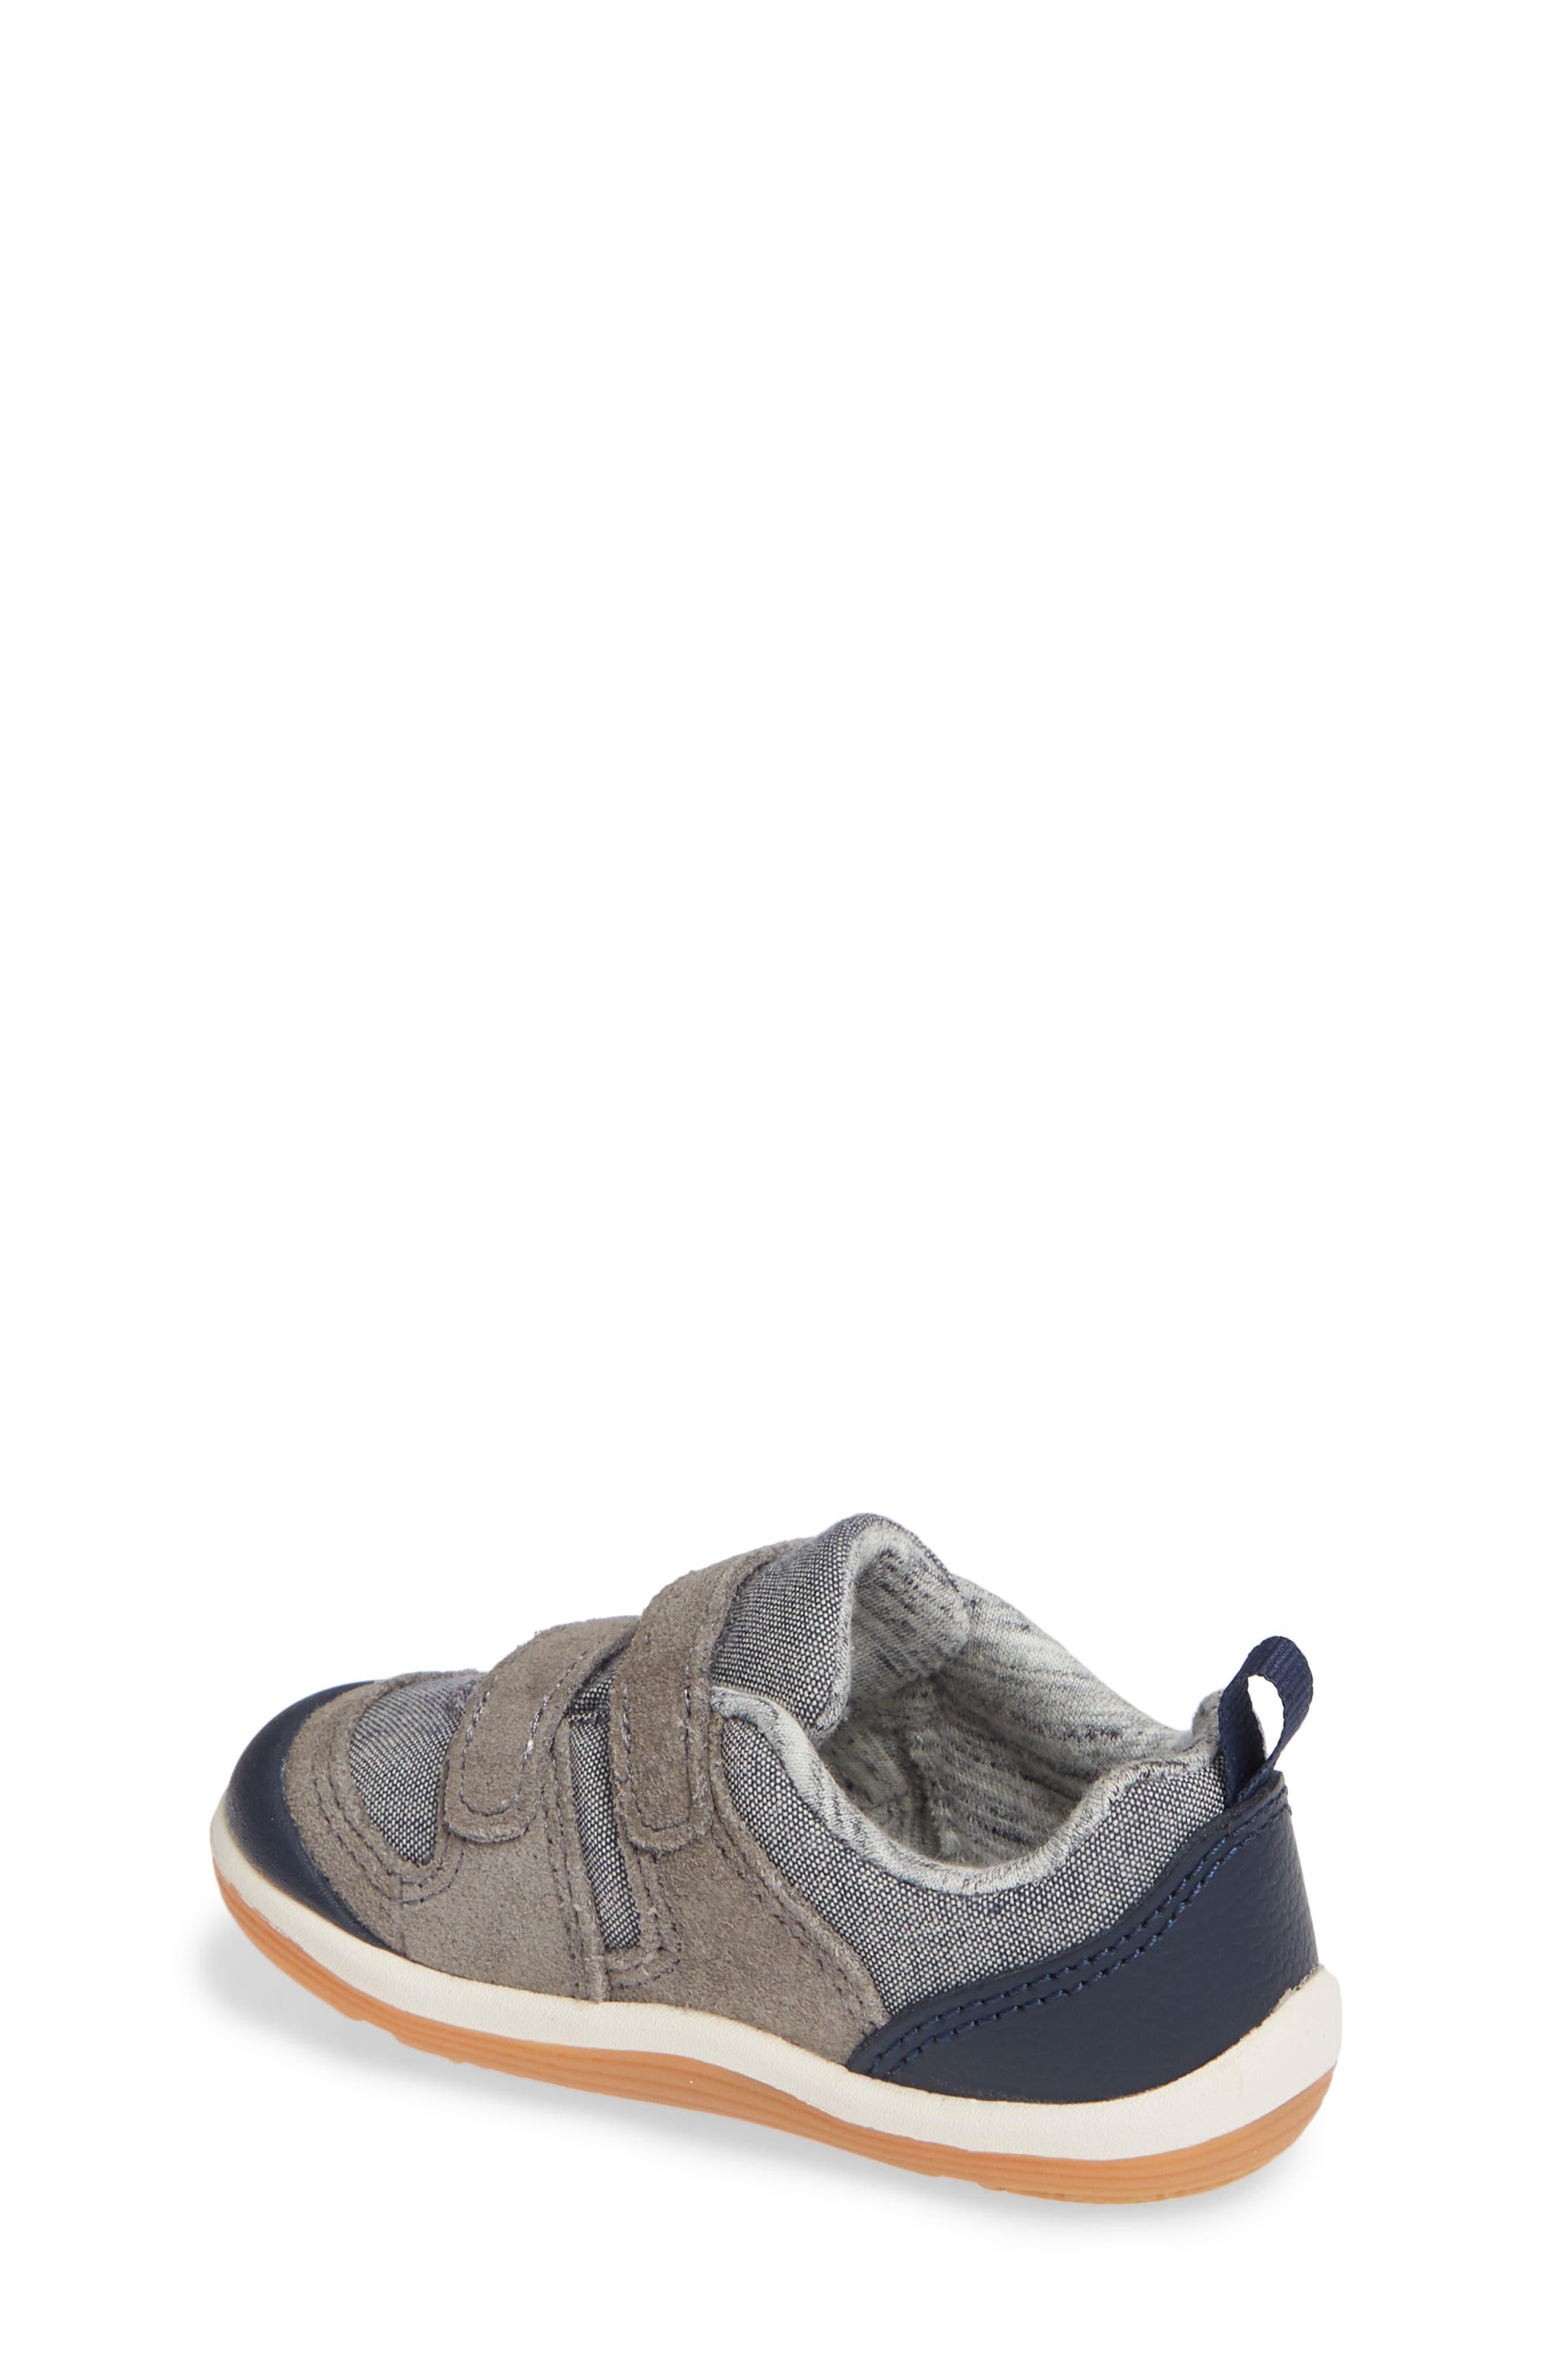 Kieran Sneaker,                             Alternate thumbnail 2, color,                             410